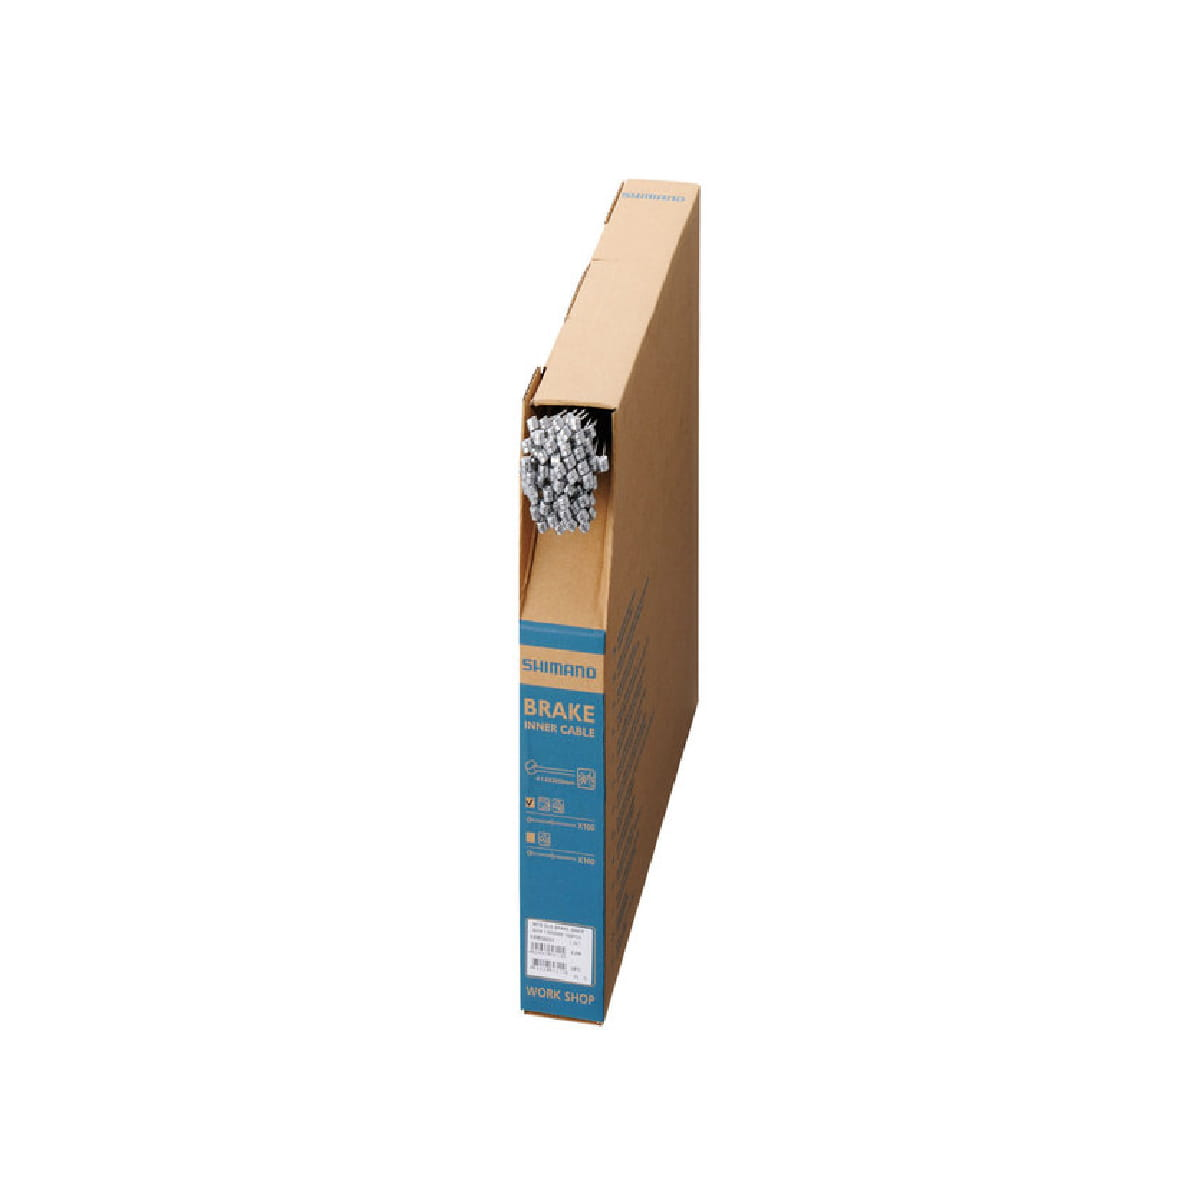 BOITE DE CABLES DE FREIN MTB SHIMANO STAINLESS 100/BOITE